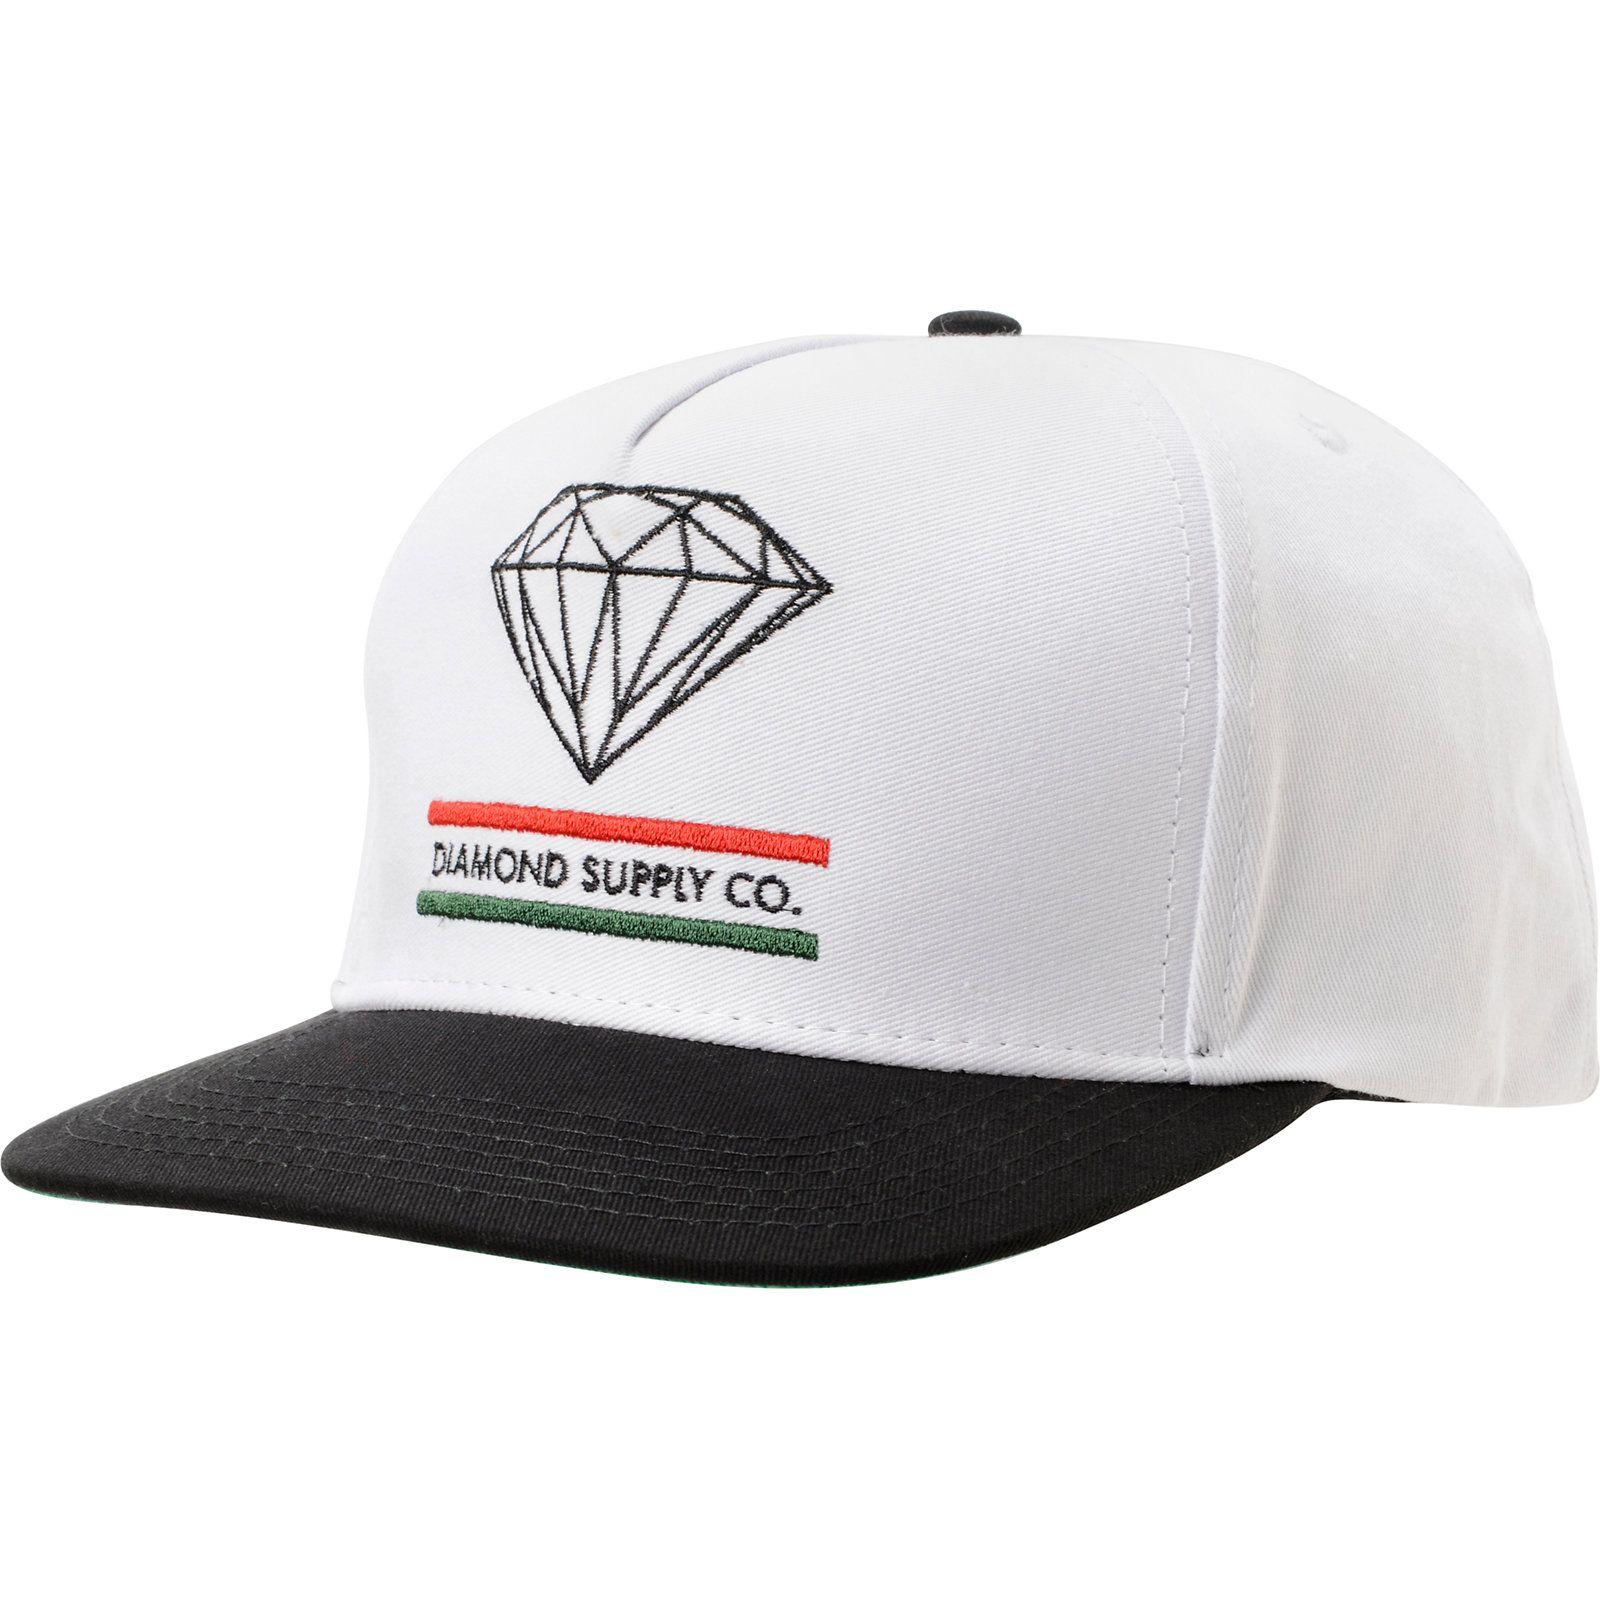 Diamond Supply Co 15 Years Of Brilliance White Snapback Hat